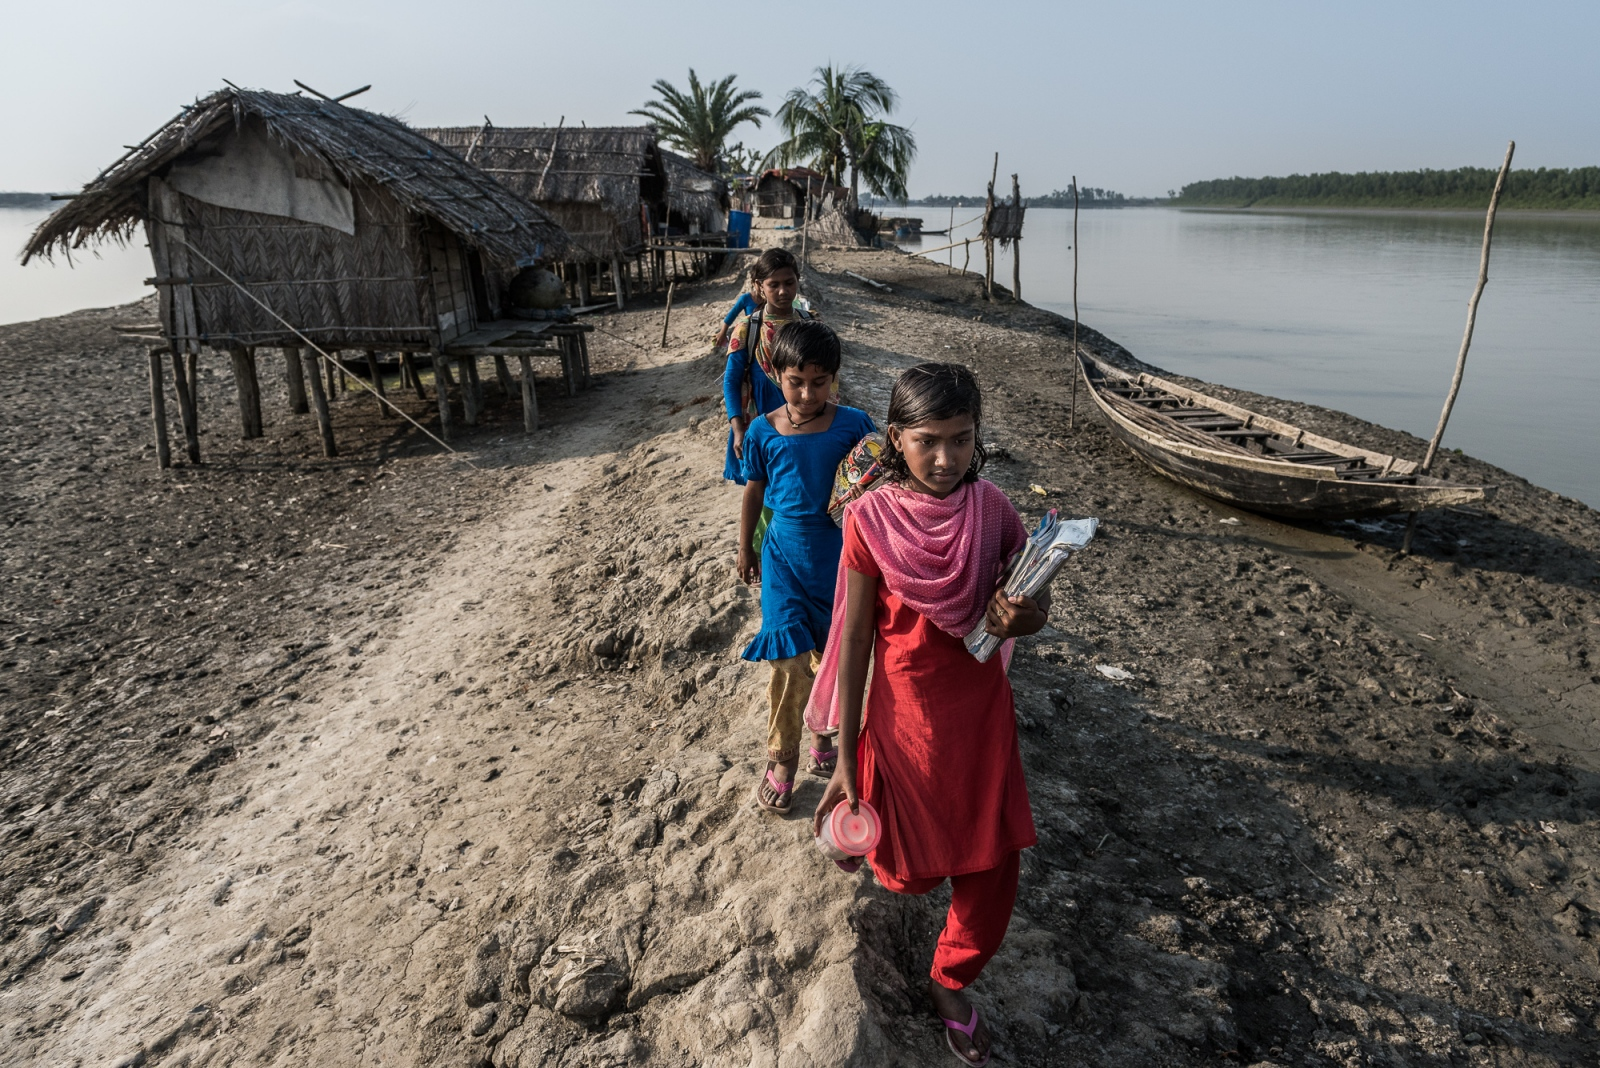 Art and Documentary Photography - Loading Climate_changed_-_Ignacio_Marin-5.jpg